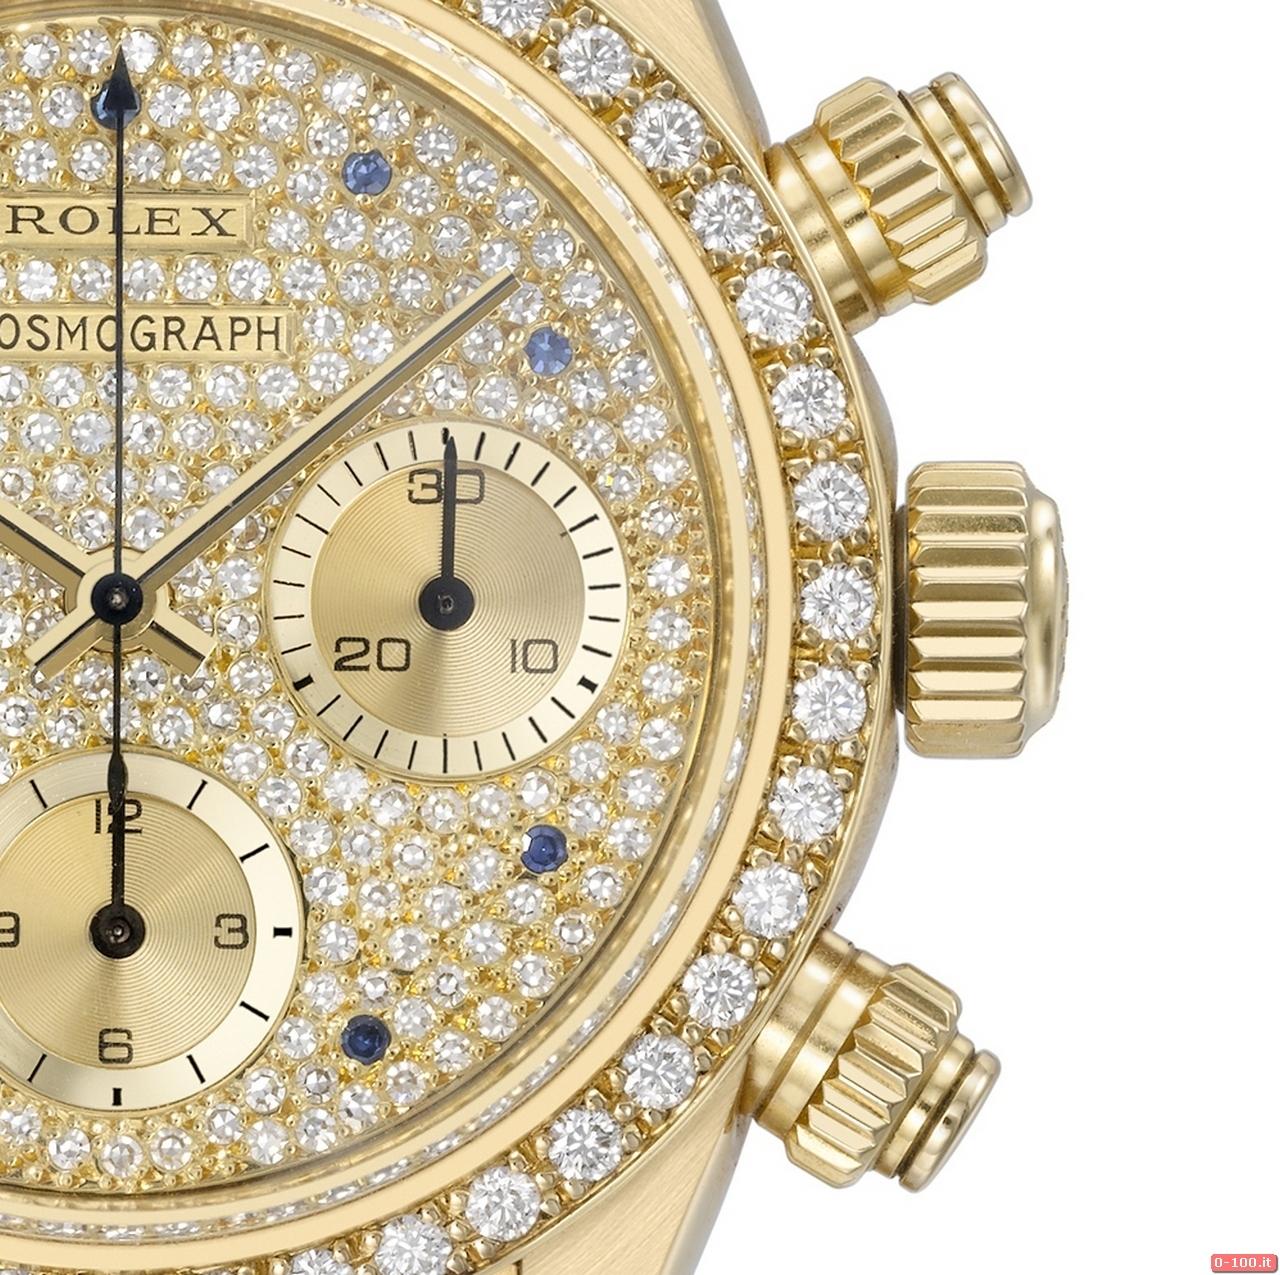 Rolex Jack of Diamonds, Ref. 6269_Christies_0-10040-100